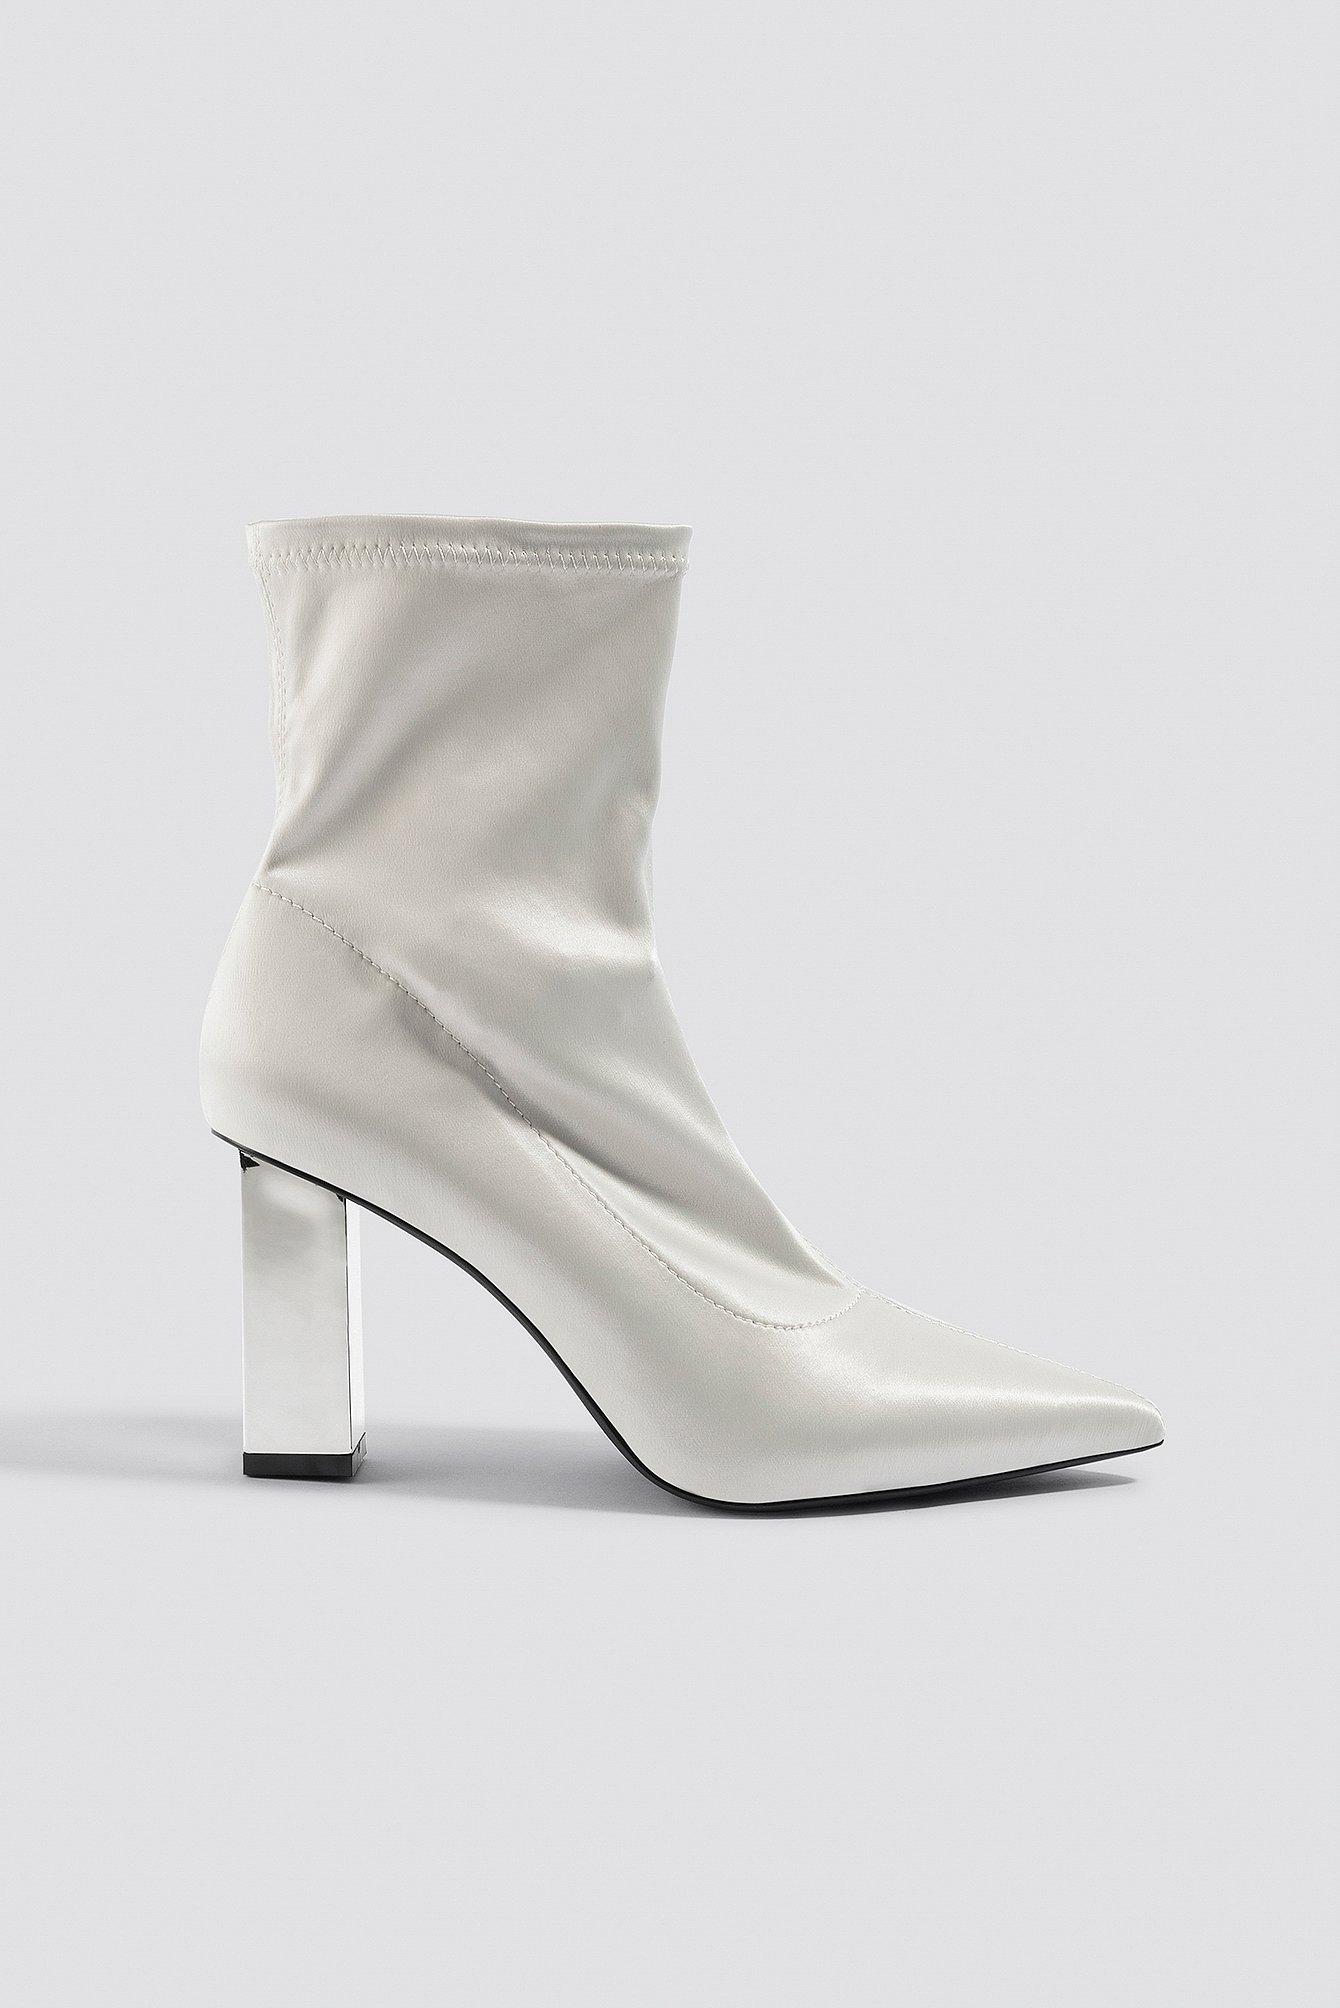 na-kd shoes -  Metallic Block Heel Sock Boots - White